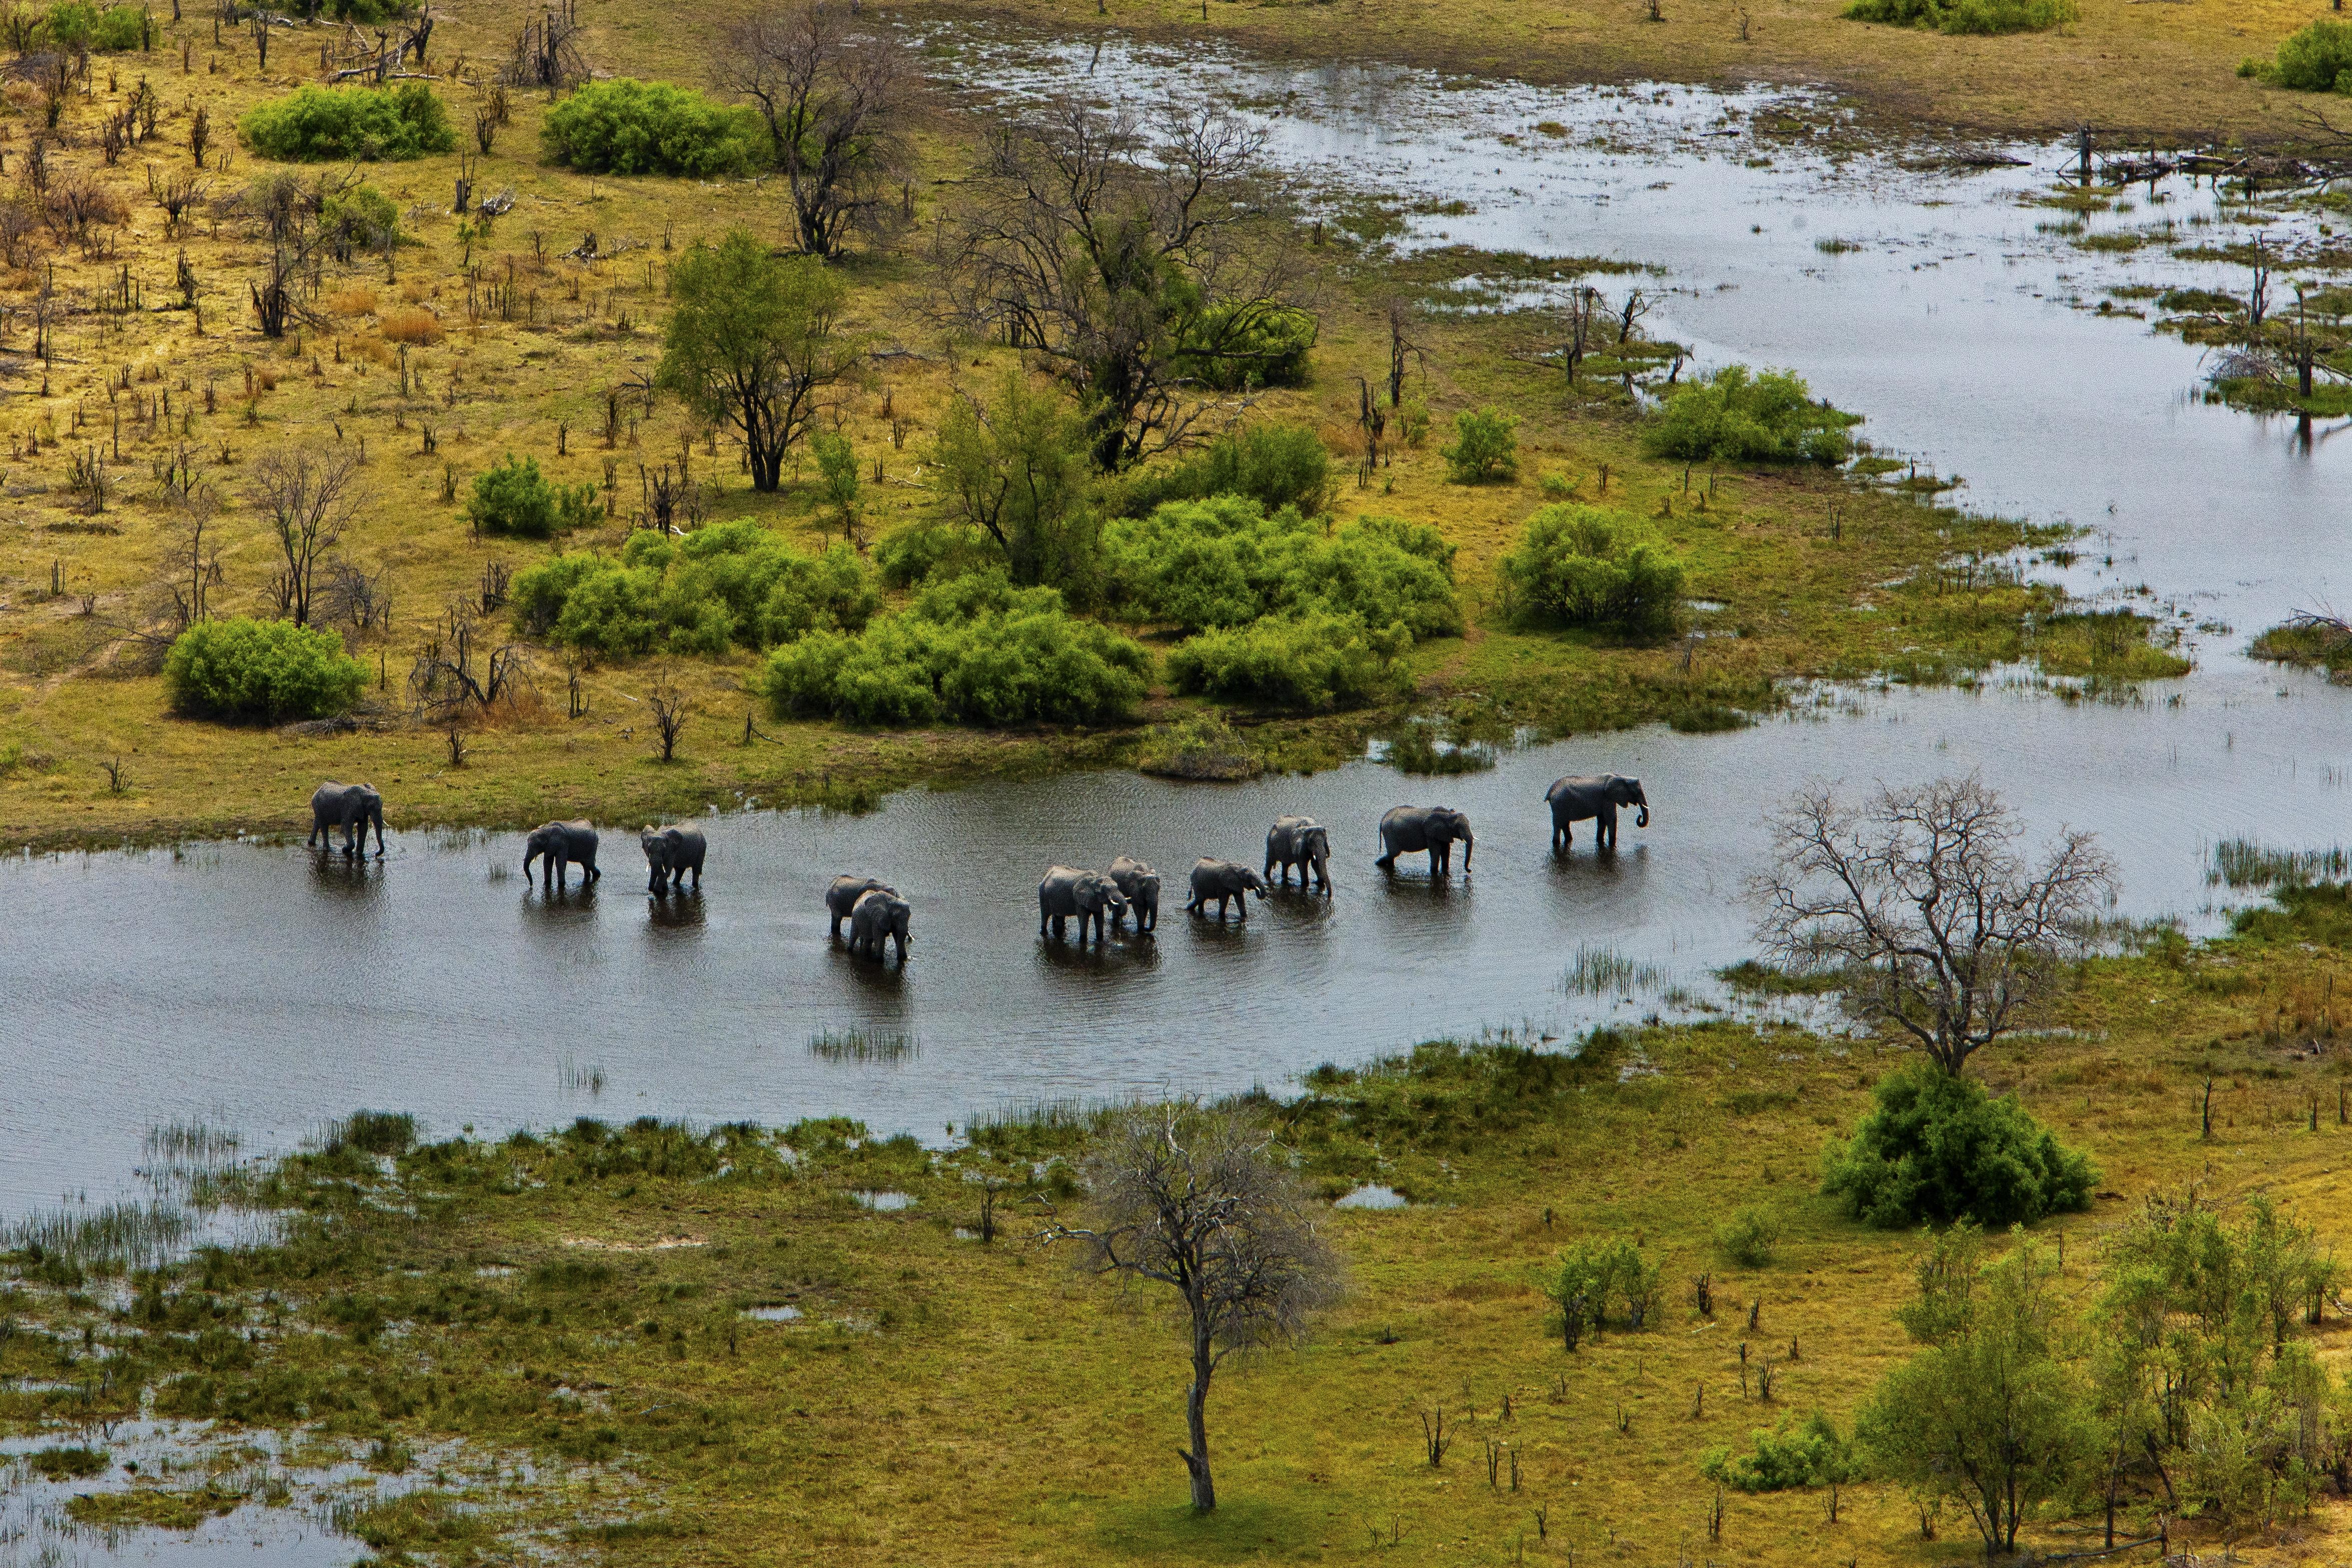 Africa,Botswana,Liyanti,Alojamiento,Selinda Explorer,animales,leopardo,árbol